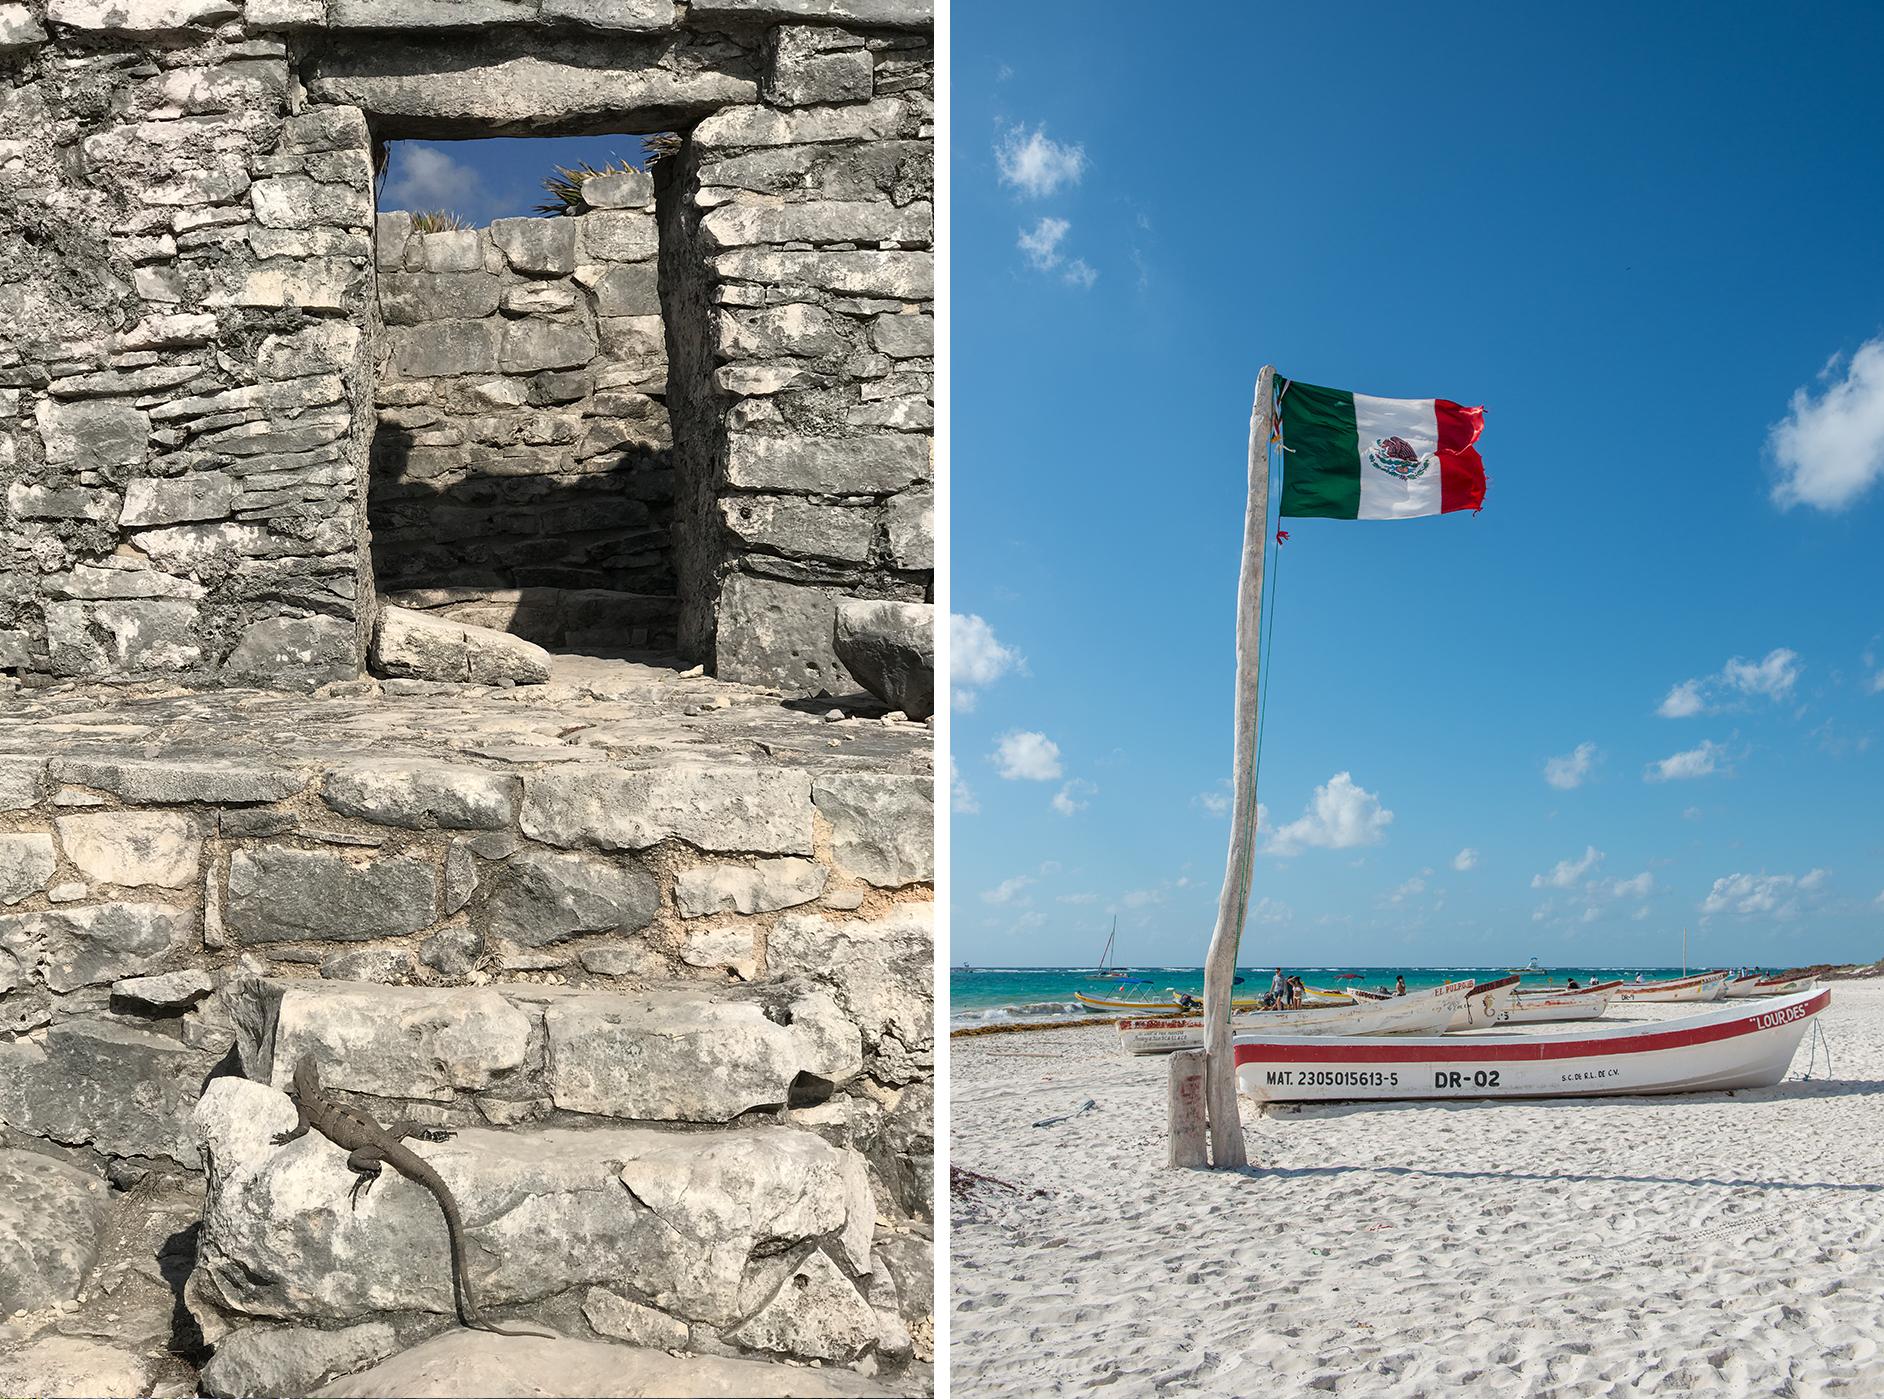 tulum ruins beach boat